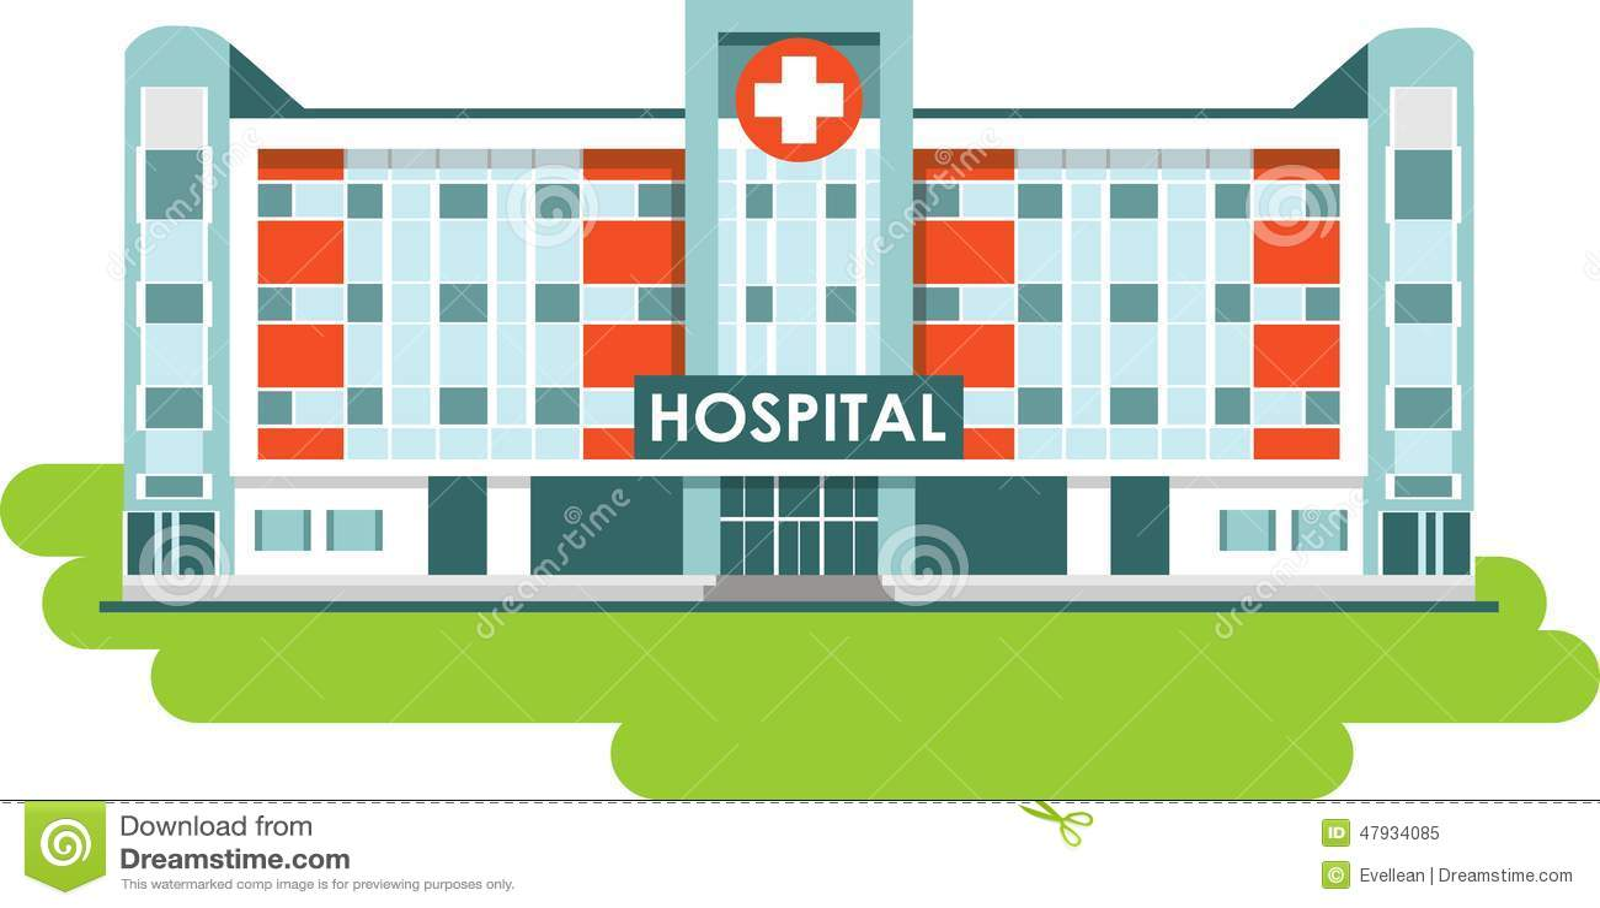 Stock Illustration Hospital Building White Background City Flat Style Image47934085 on Modern Office Building Plans